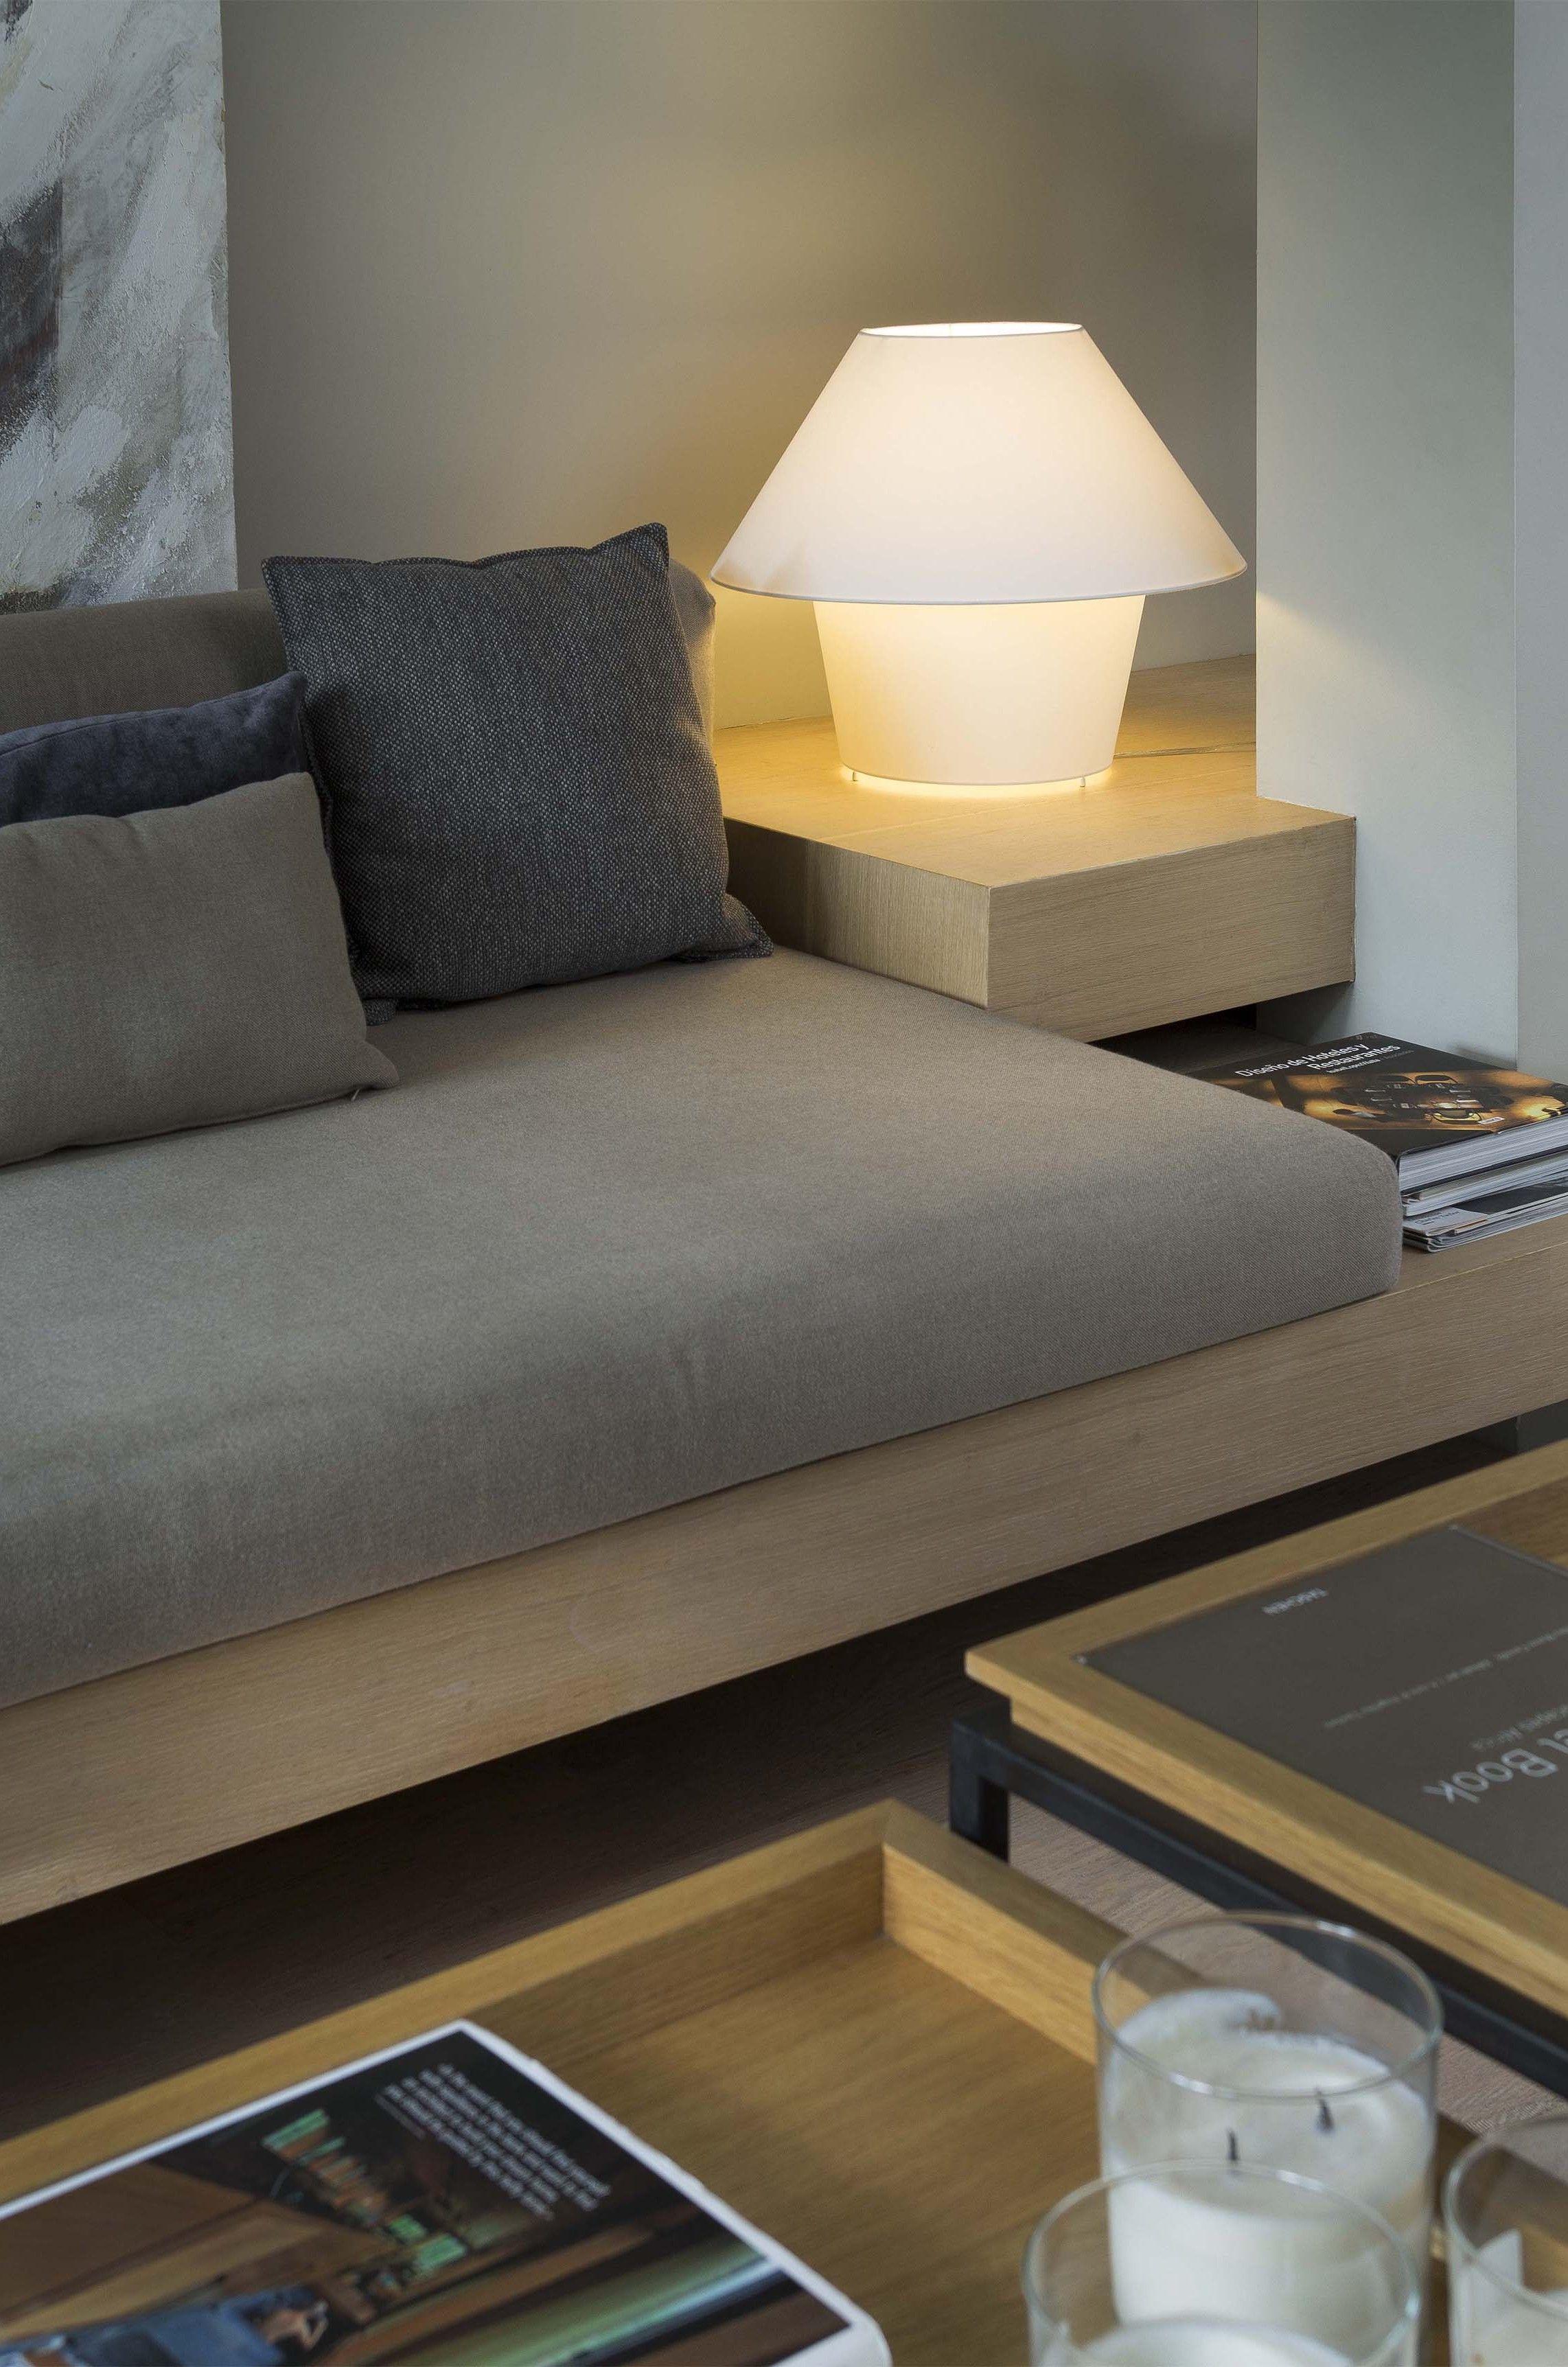 Lampe A Poser Design Salon Idee De Luminaire Et Lampe Maison